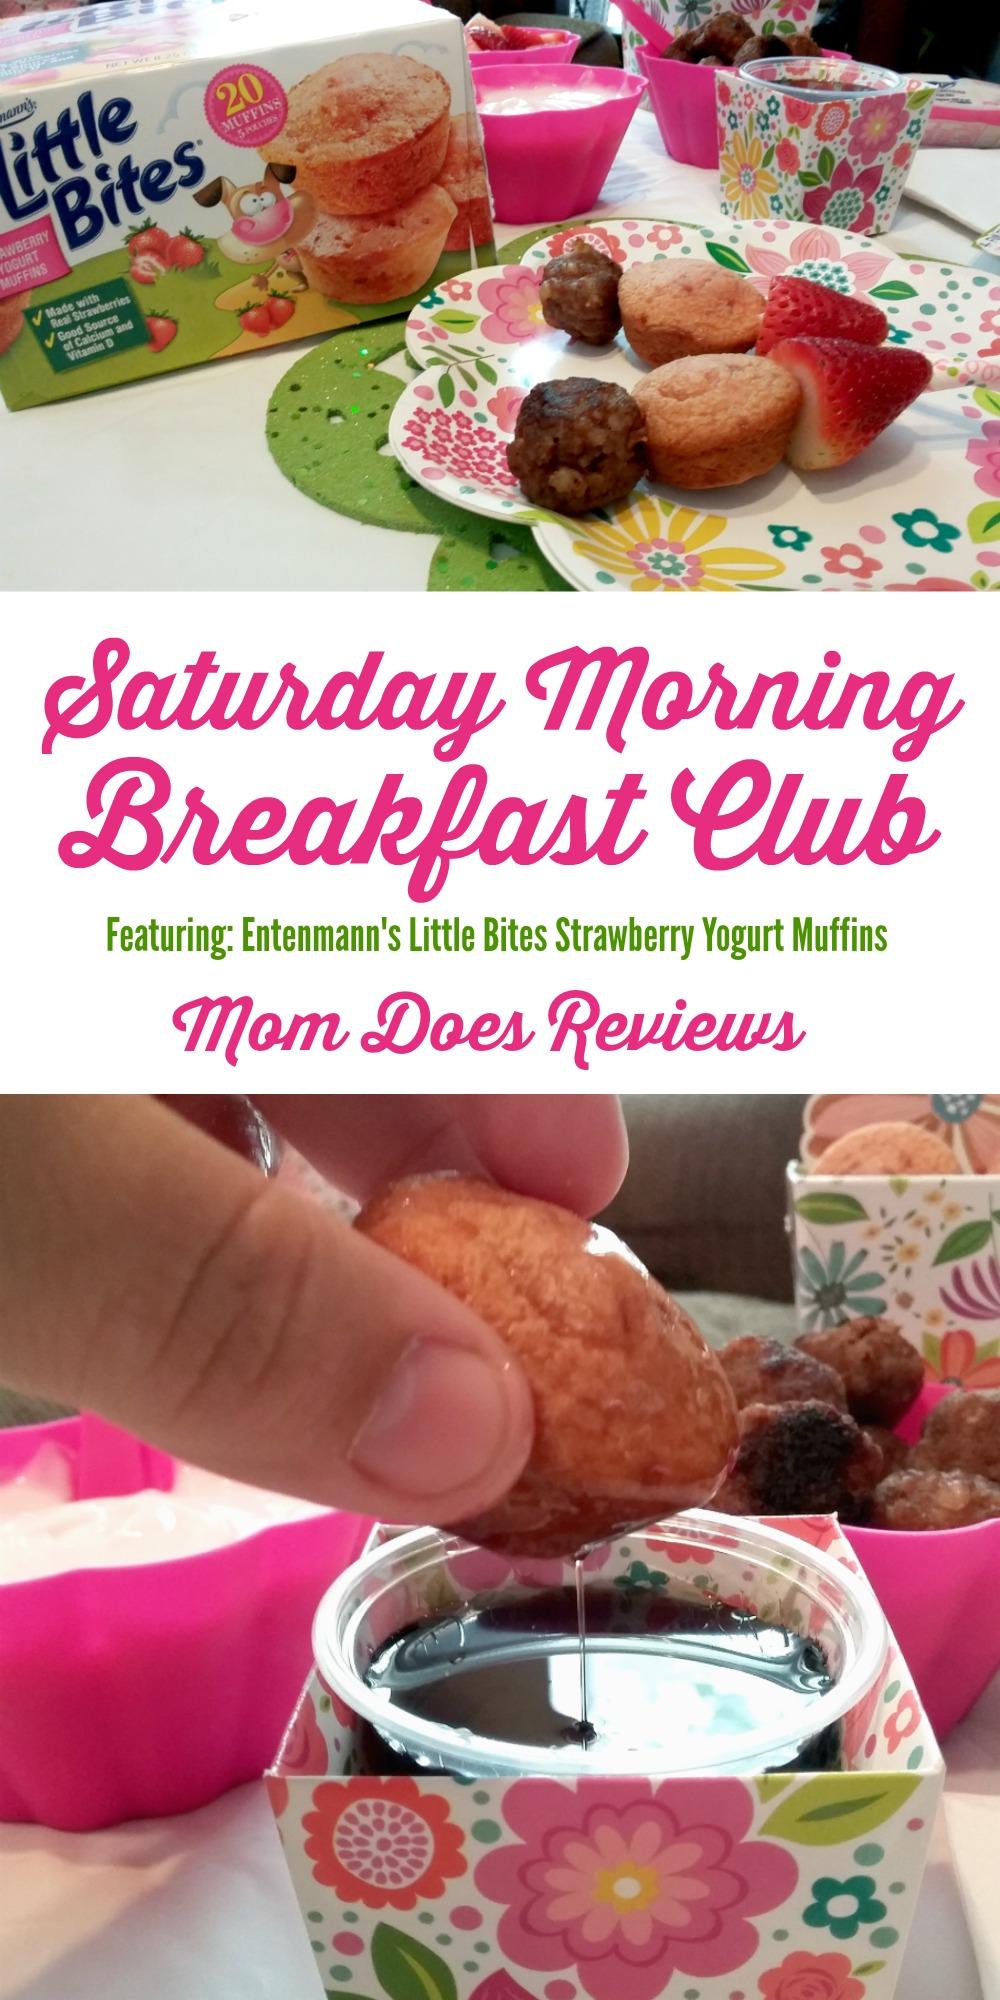 Saturday Morning Breakfast Club